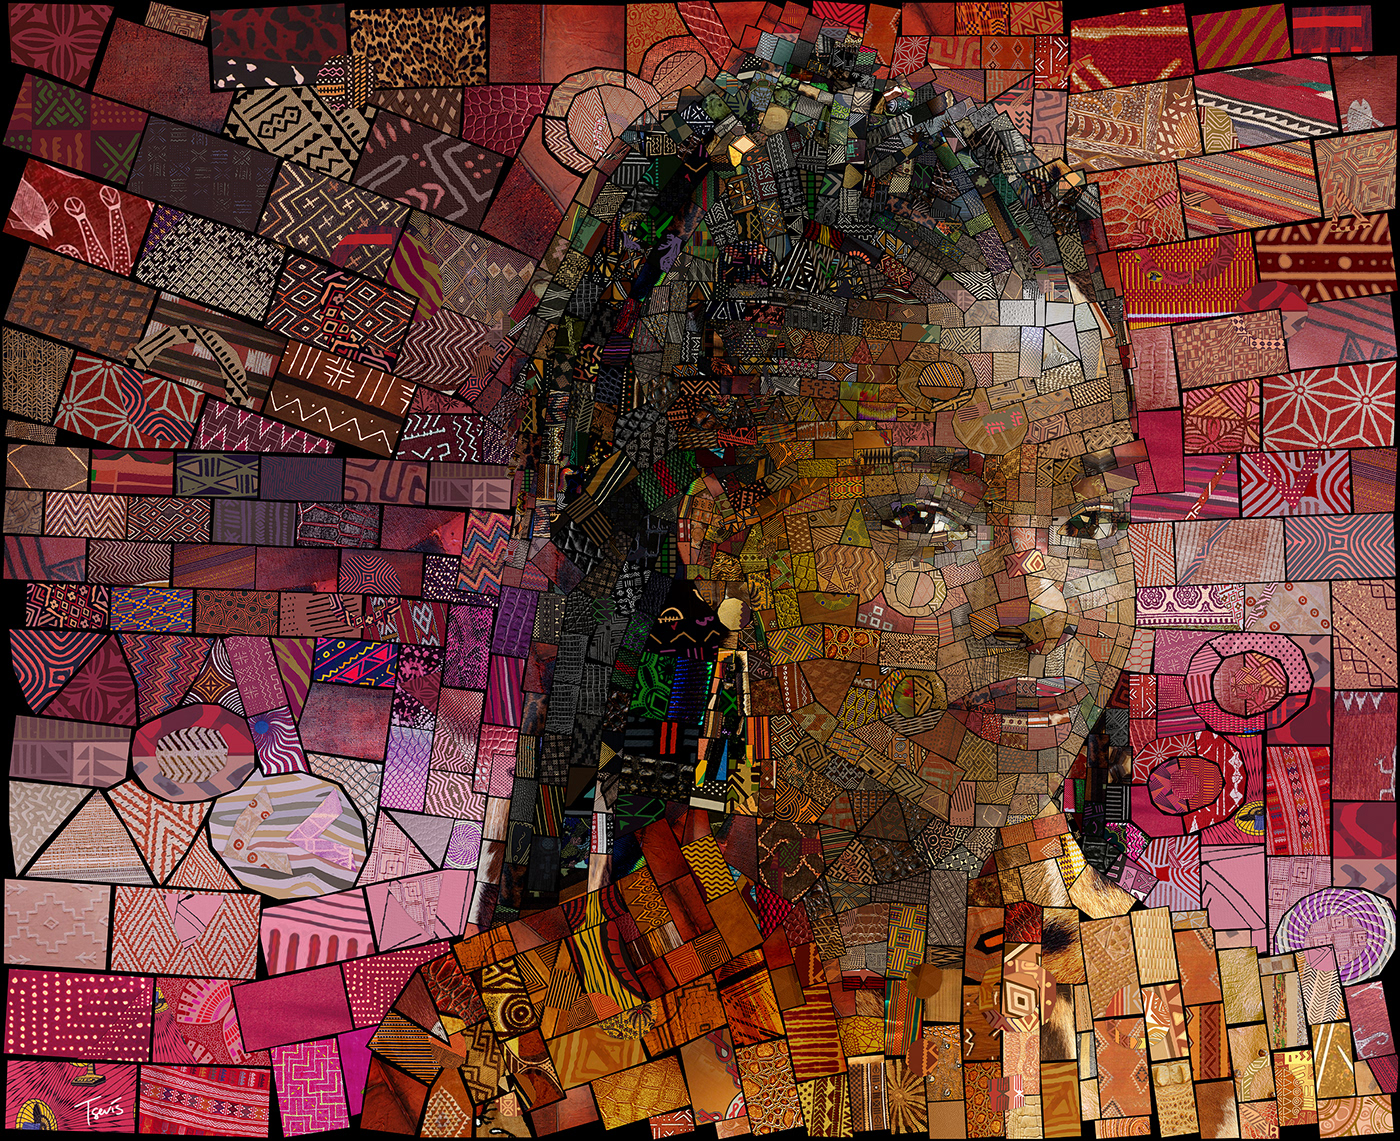 The African Bricks